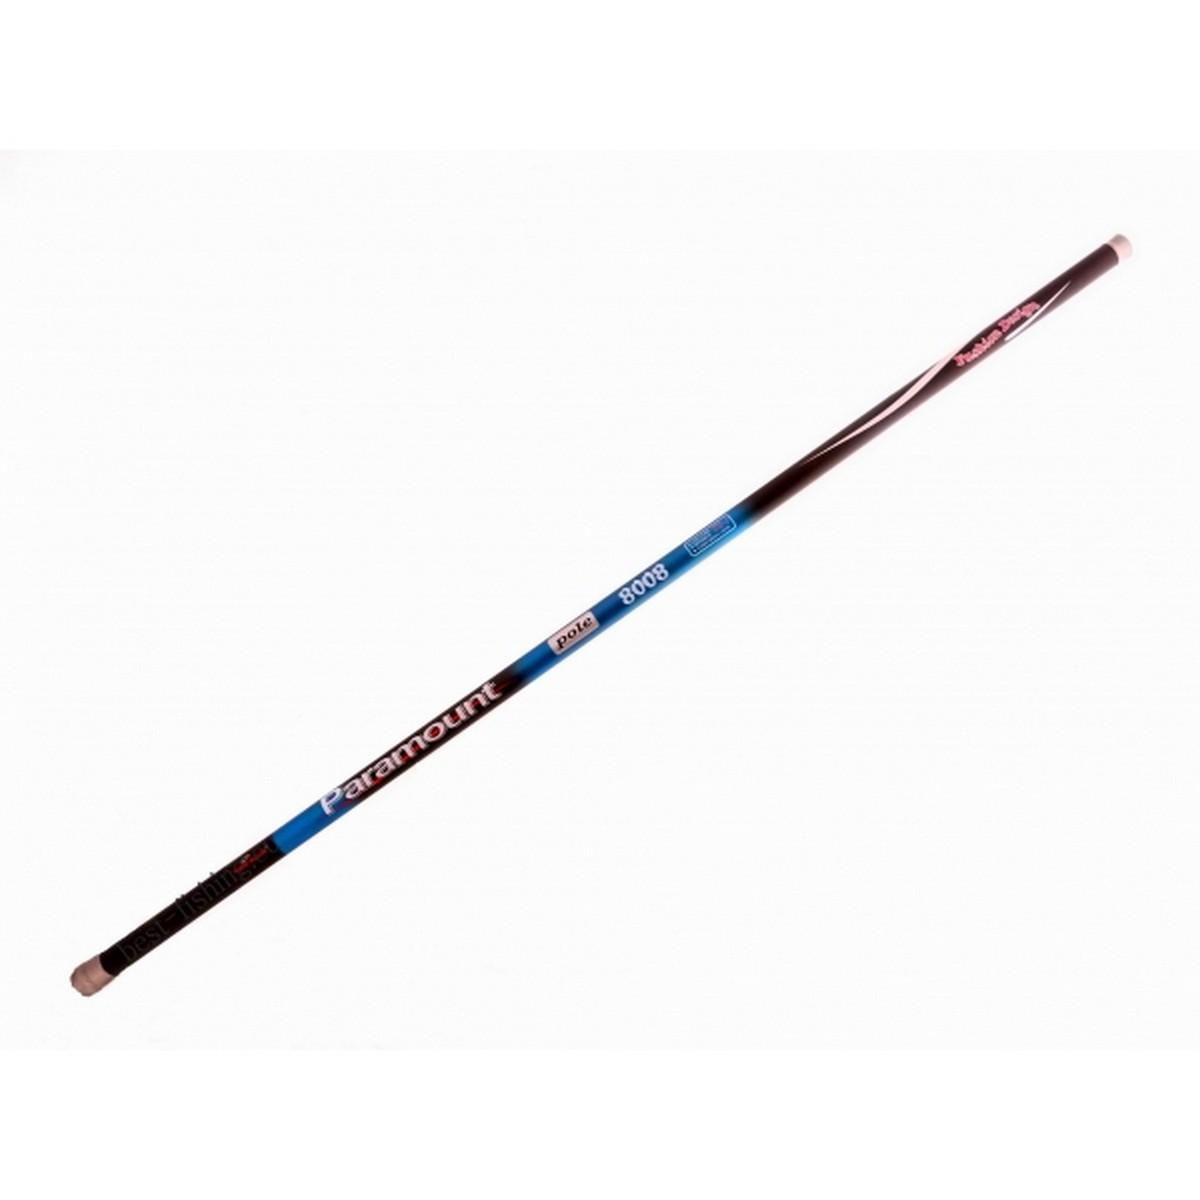 Wind Blade Paramount Pole-0